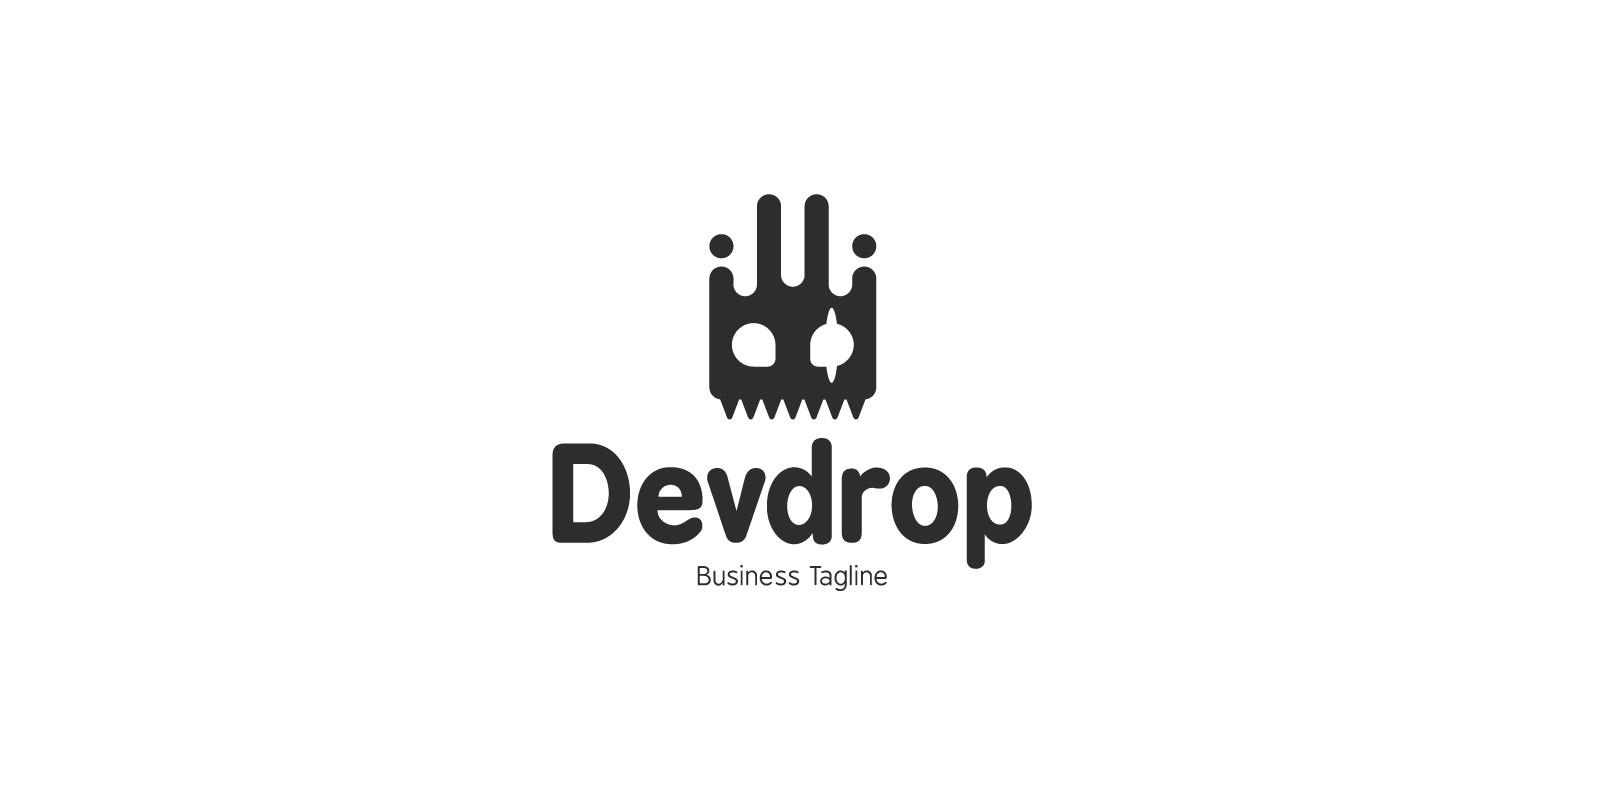 Drop Devil Logo Template